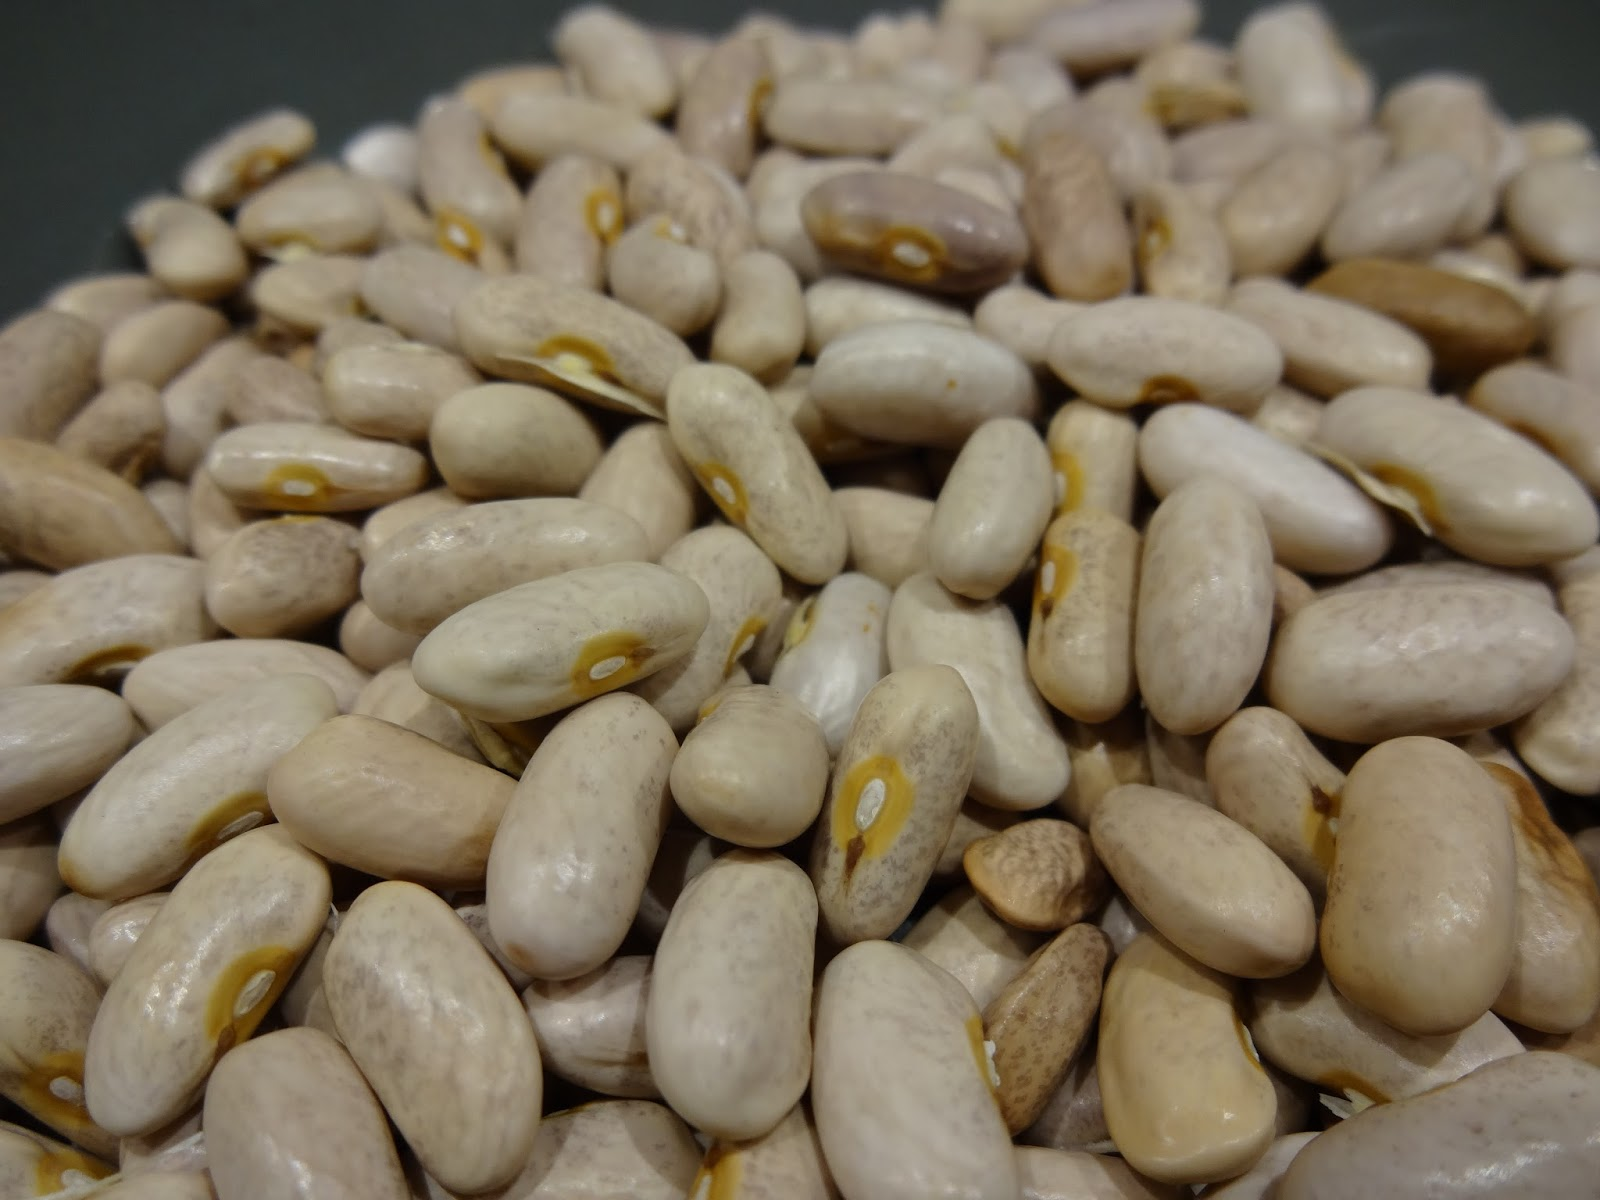 The Scientific Gardener: Royal Burgundy Bush Beans